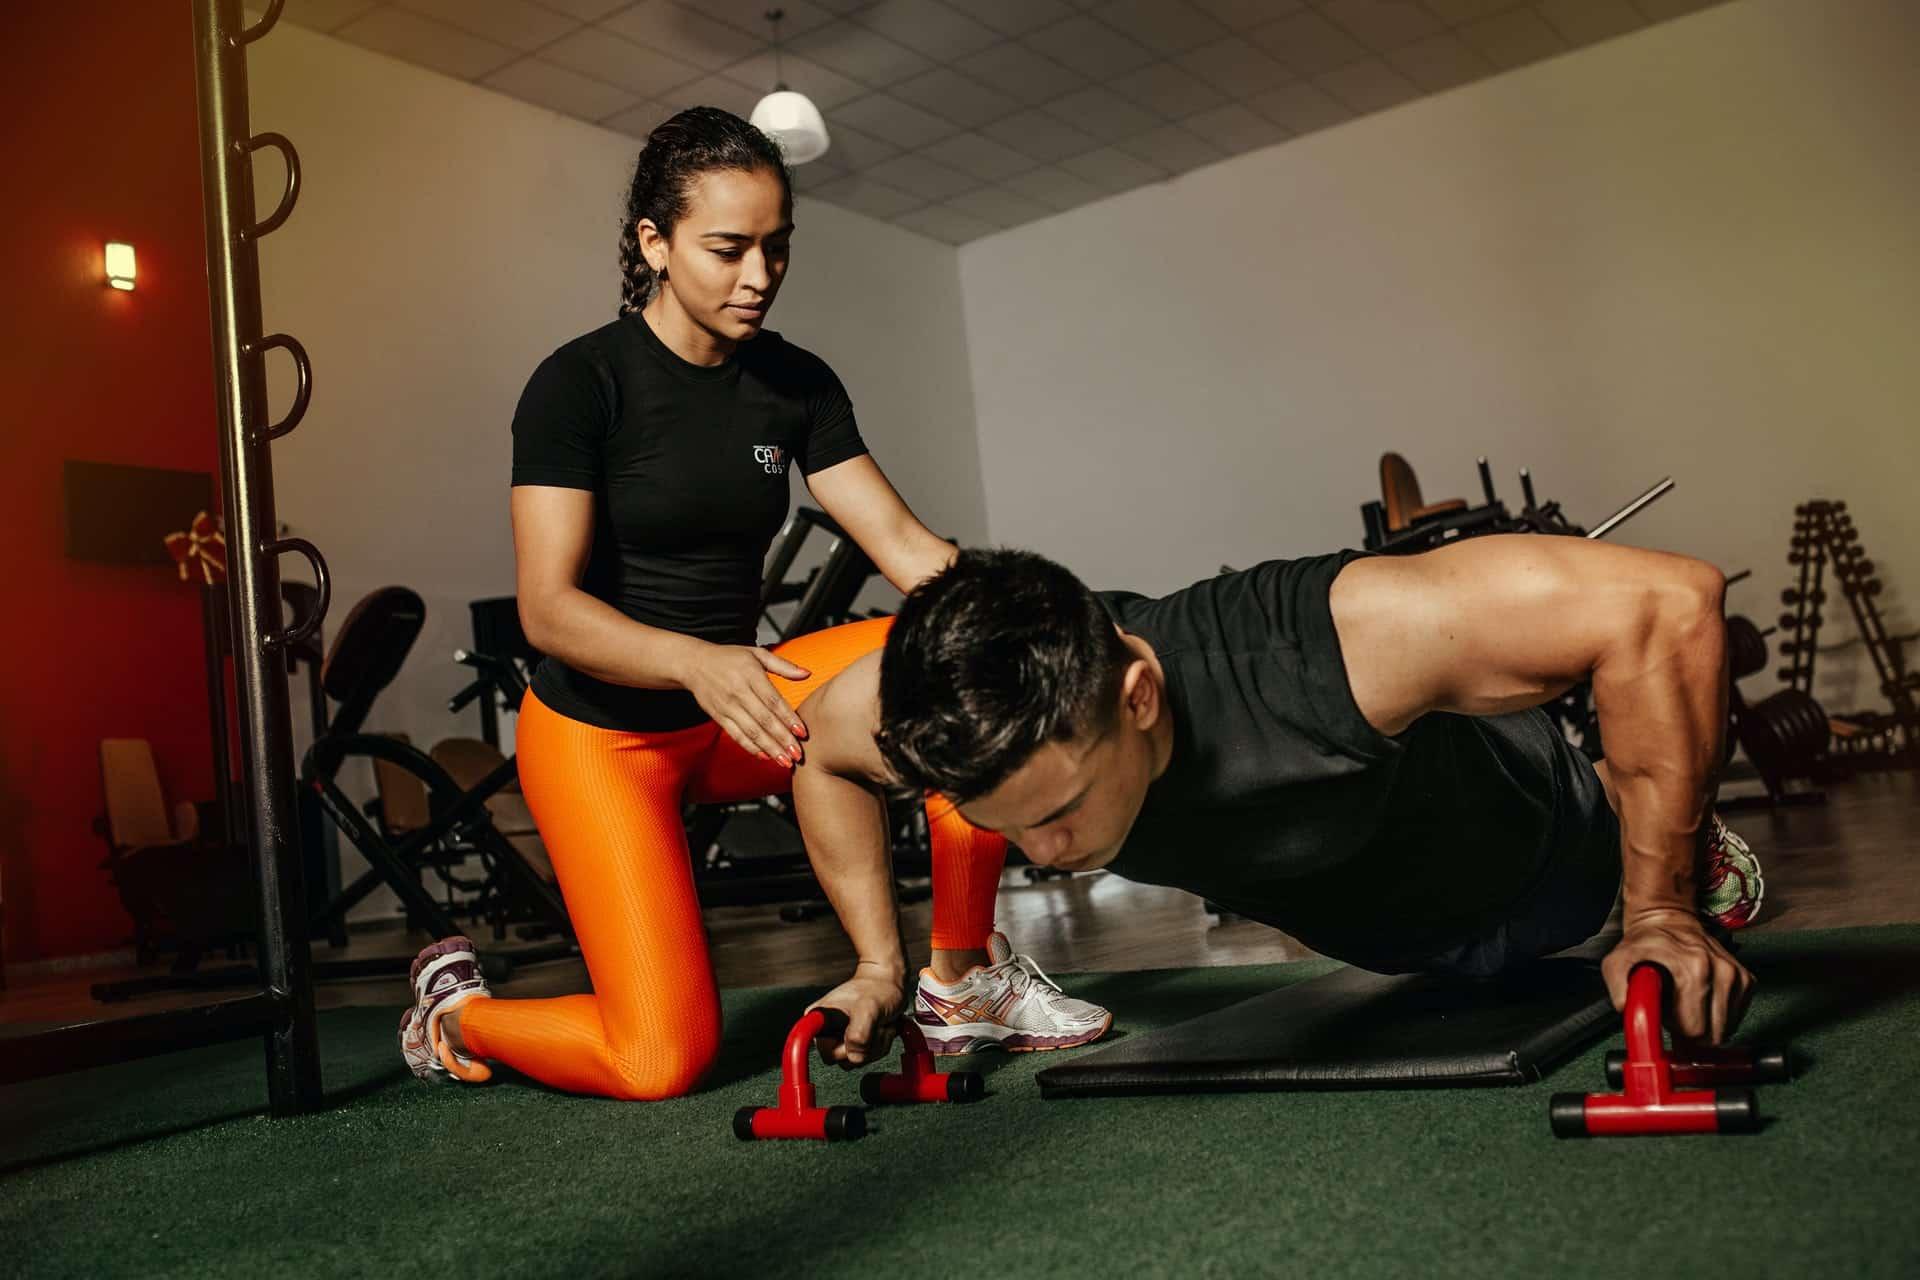 Health Wellness Career Paths Article Image